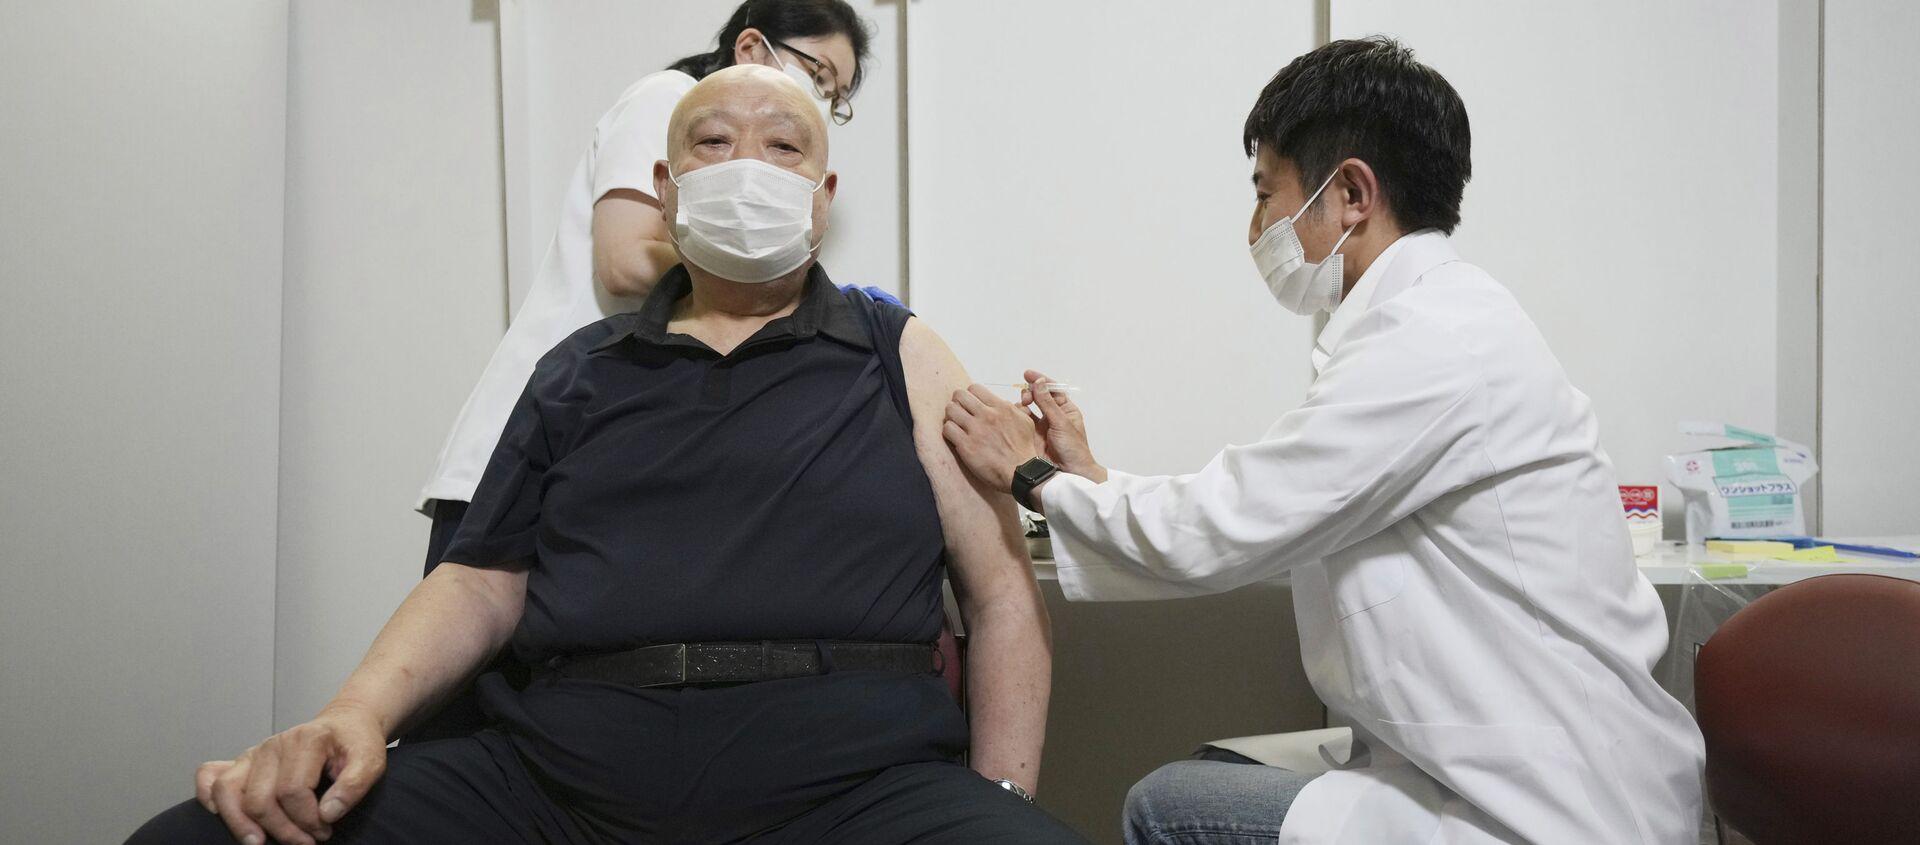 Пандемия коронавируса - вакцинация вакциной Pfizer - Sputnik Грузия, 1920, 04.06.2021